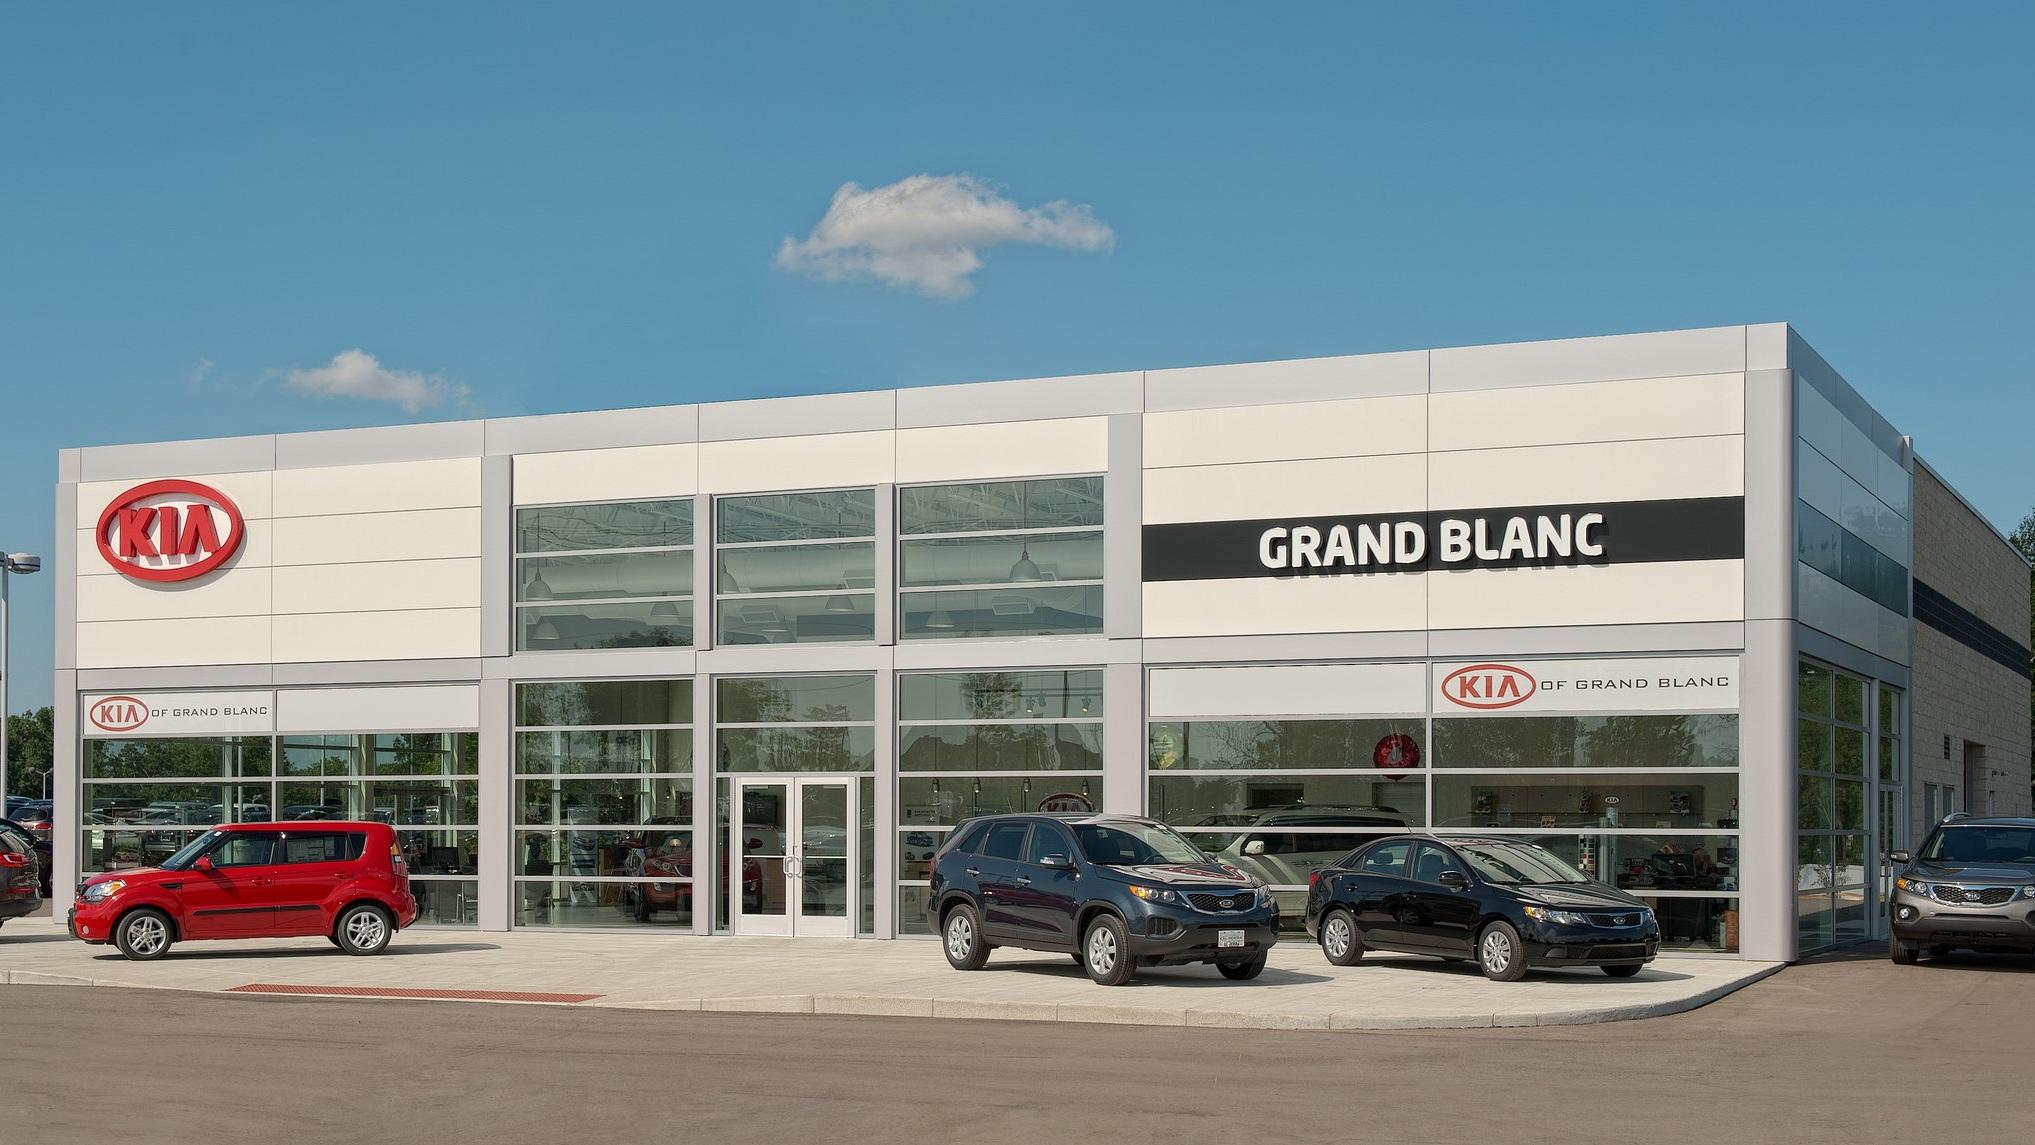 Grand.Blanc%2C+MI.Kia+%281%29.jpg